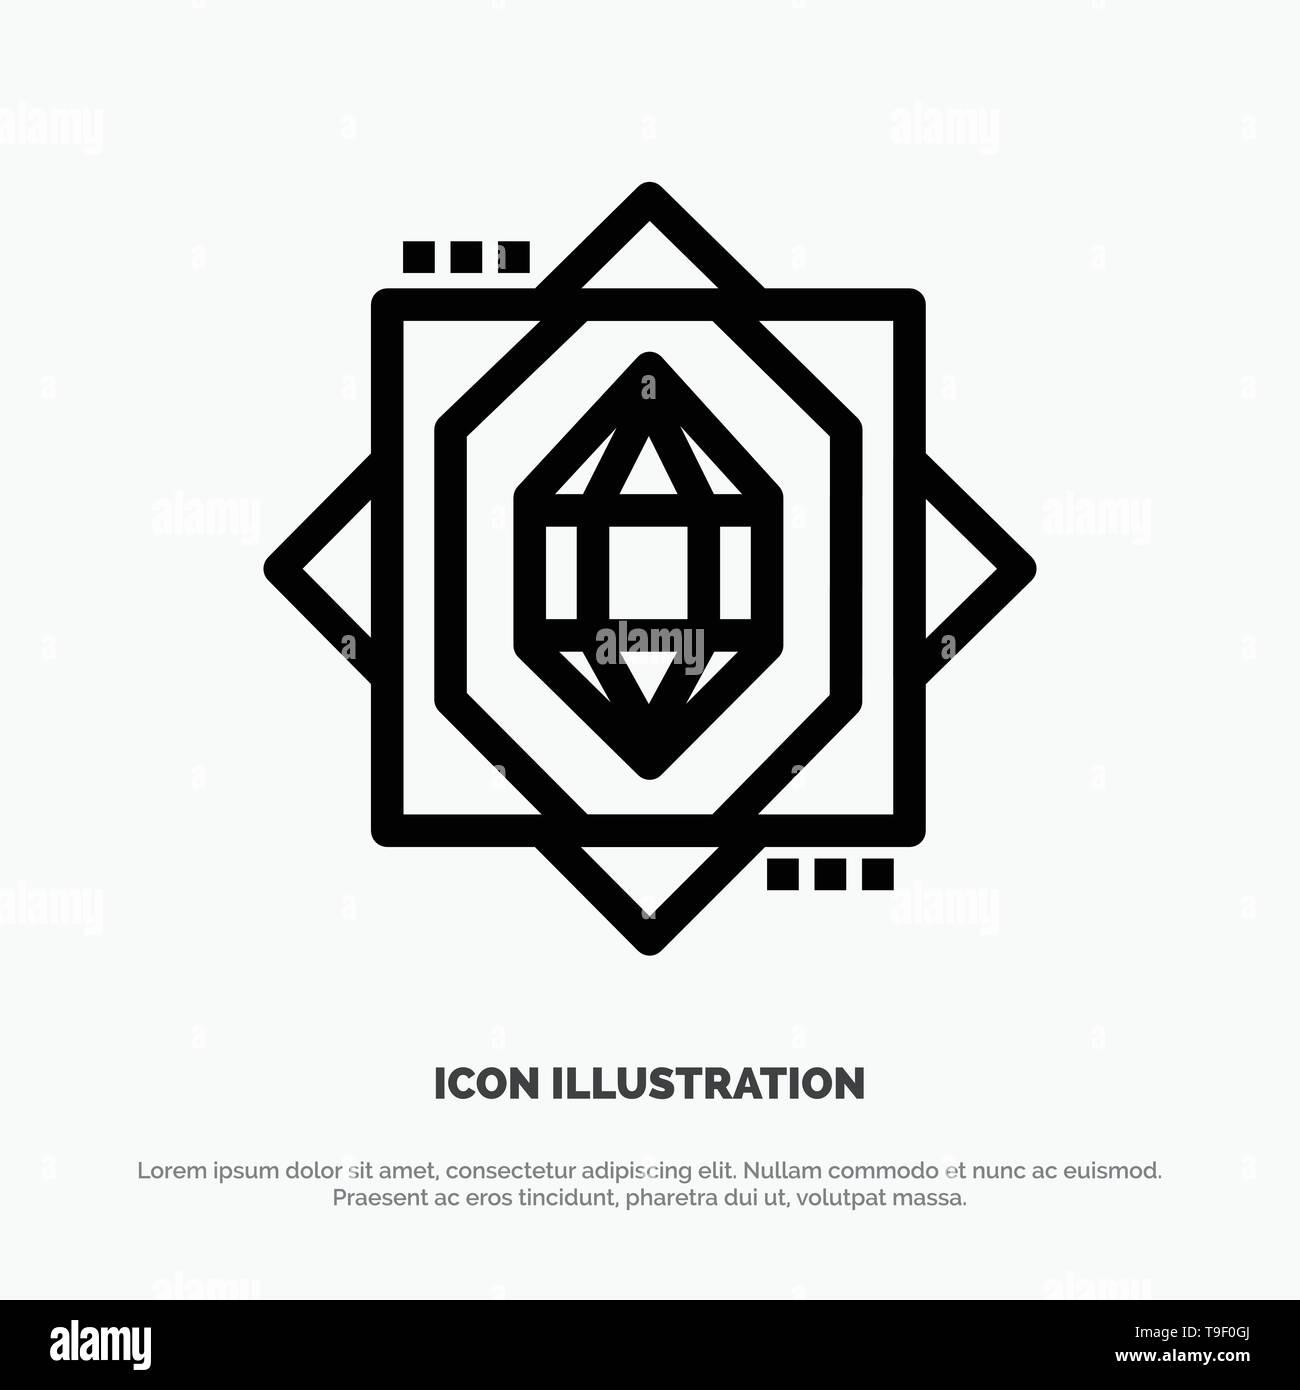 3d, Core, Forming, Design Vector Line Icon - Stock Vector